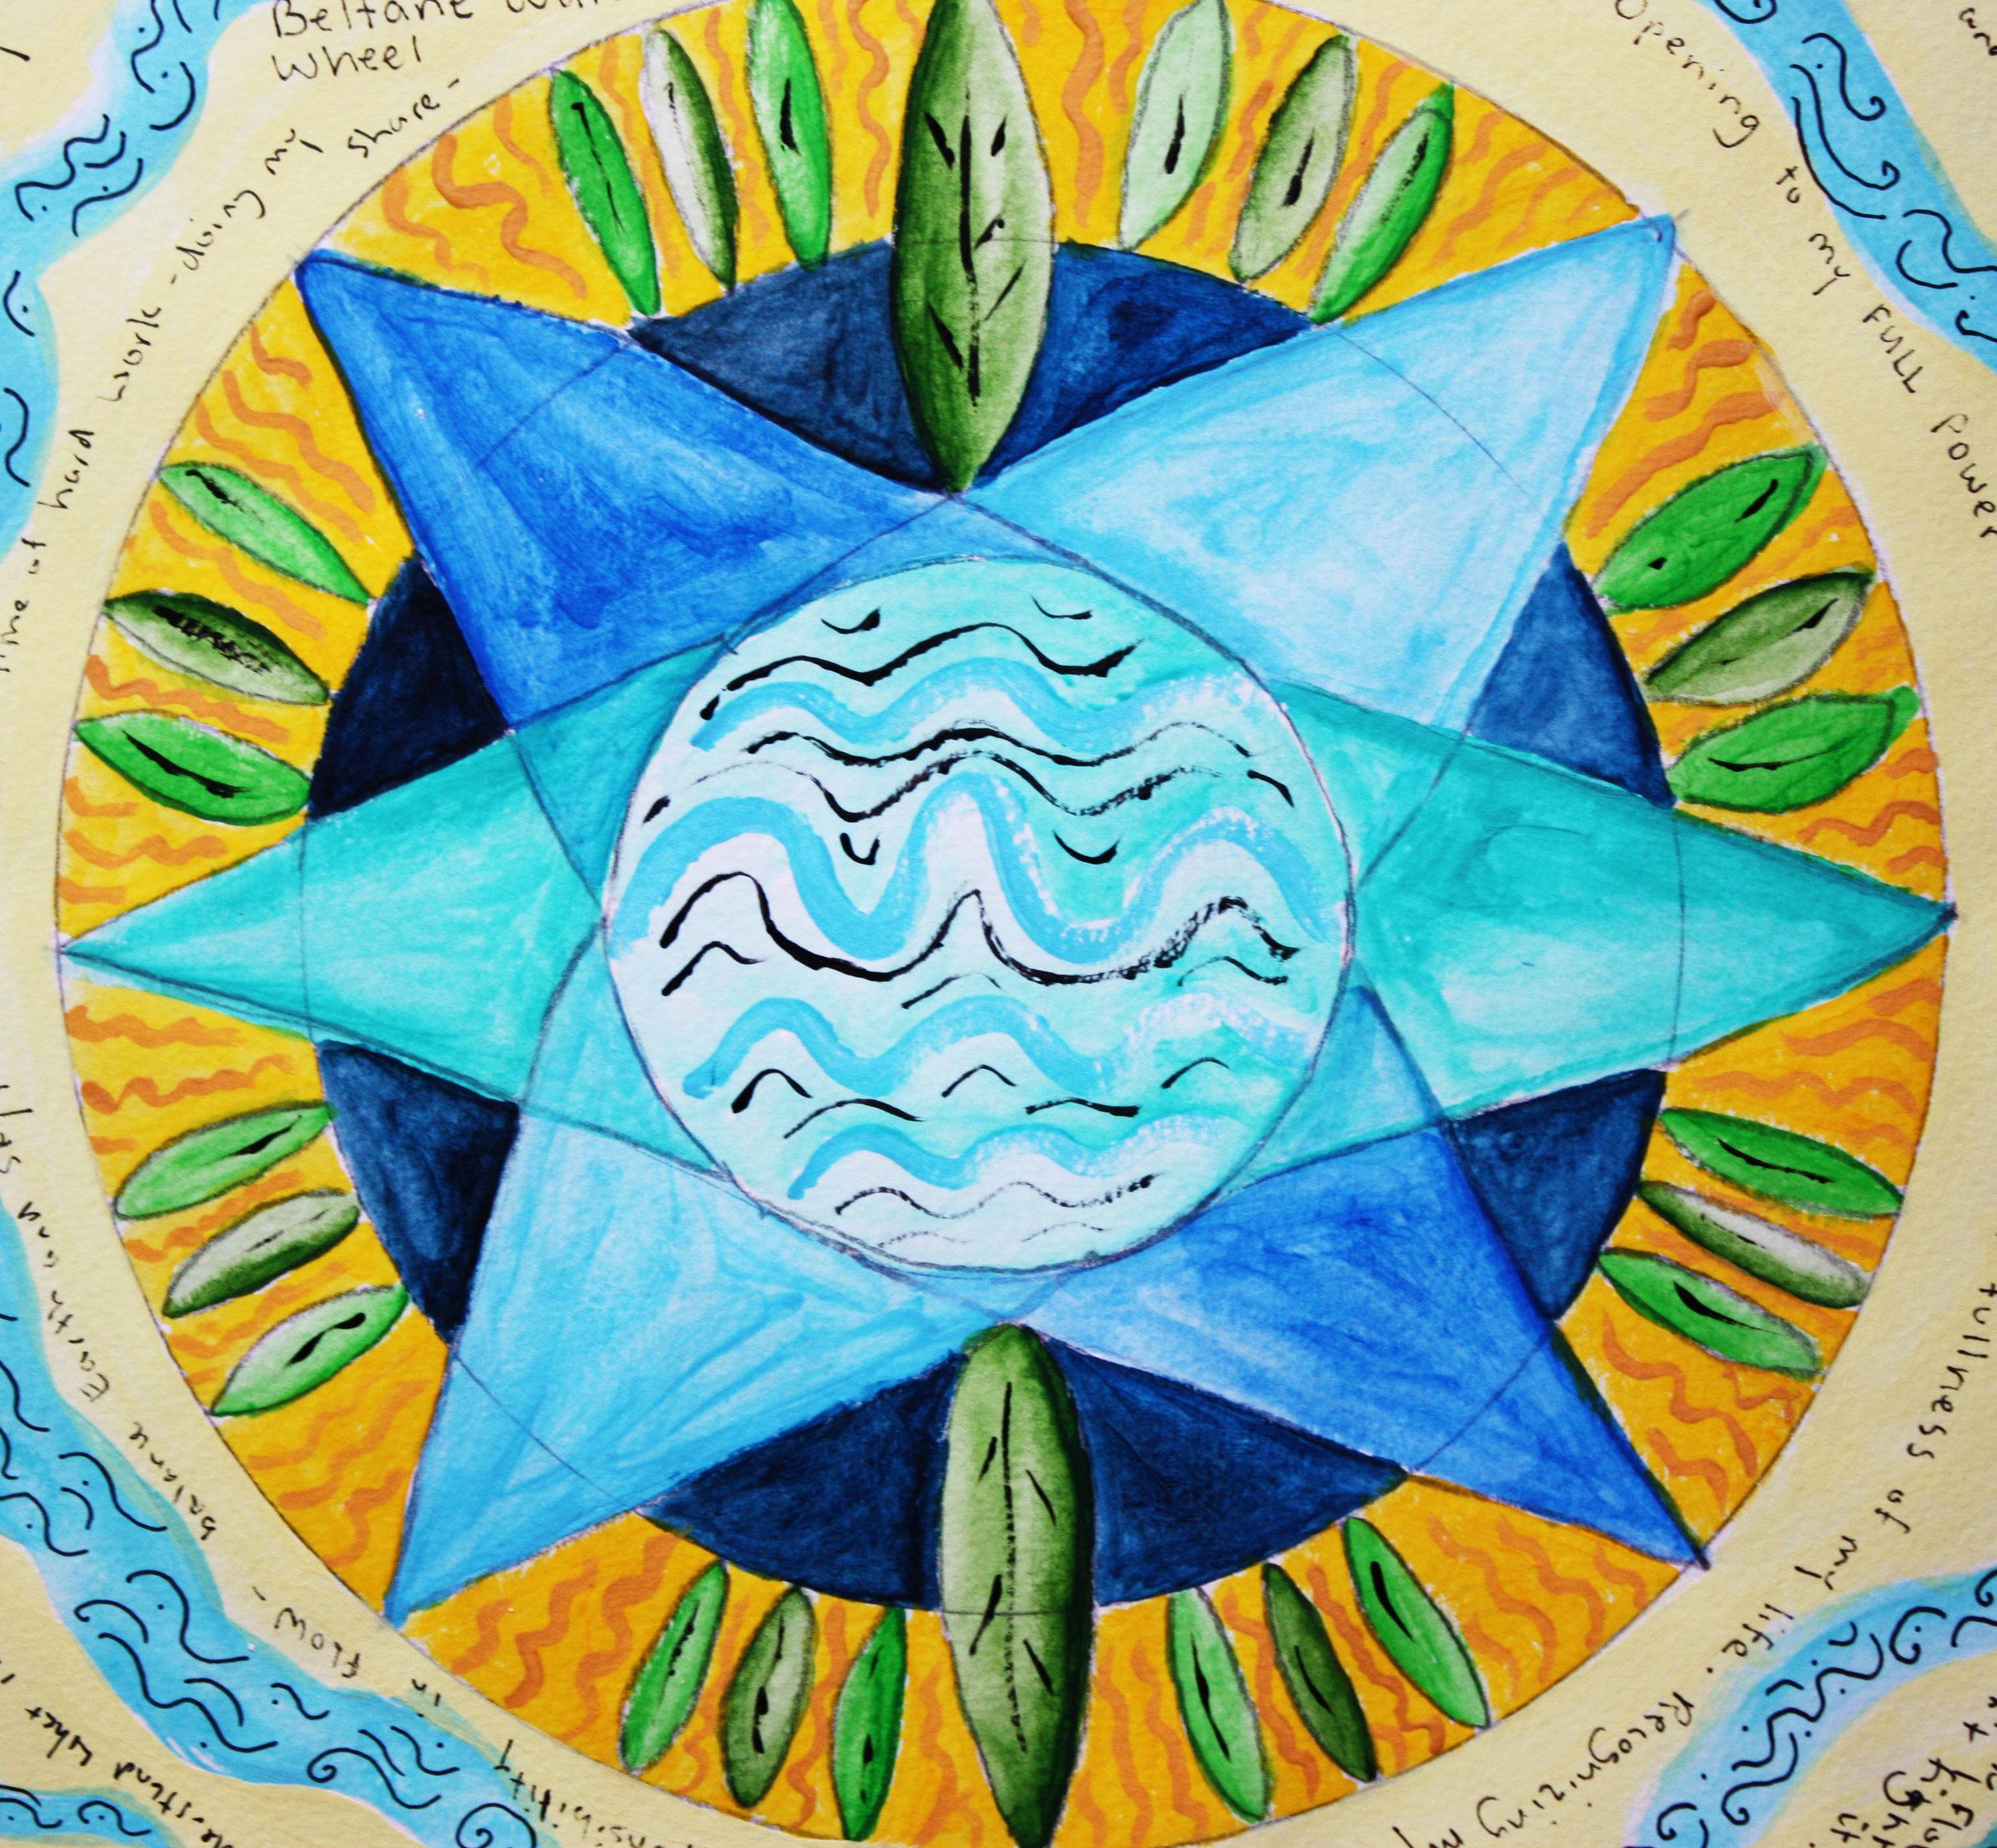 Listen to artist, yogini and mother Lisa Hofmann share about creative practice, self-care, presence and healing... (Mandala by Lisa Hofmann)